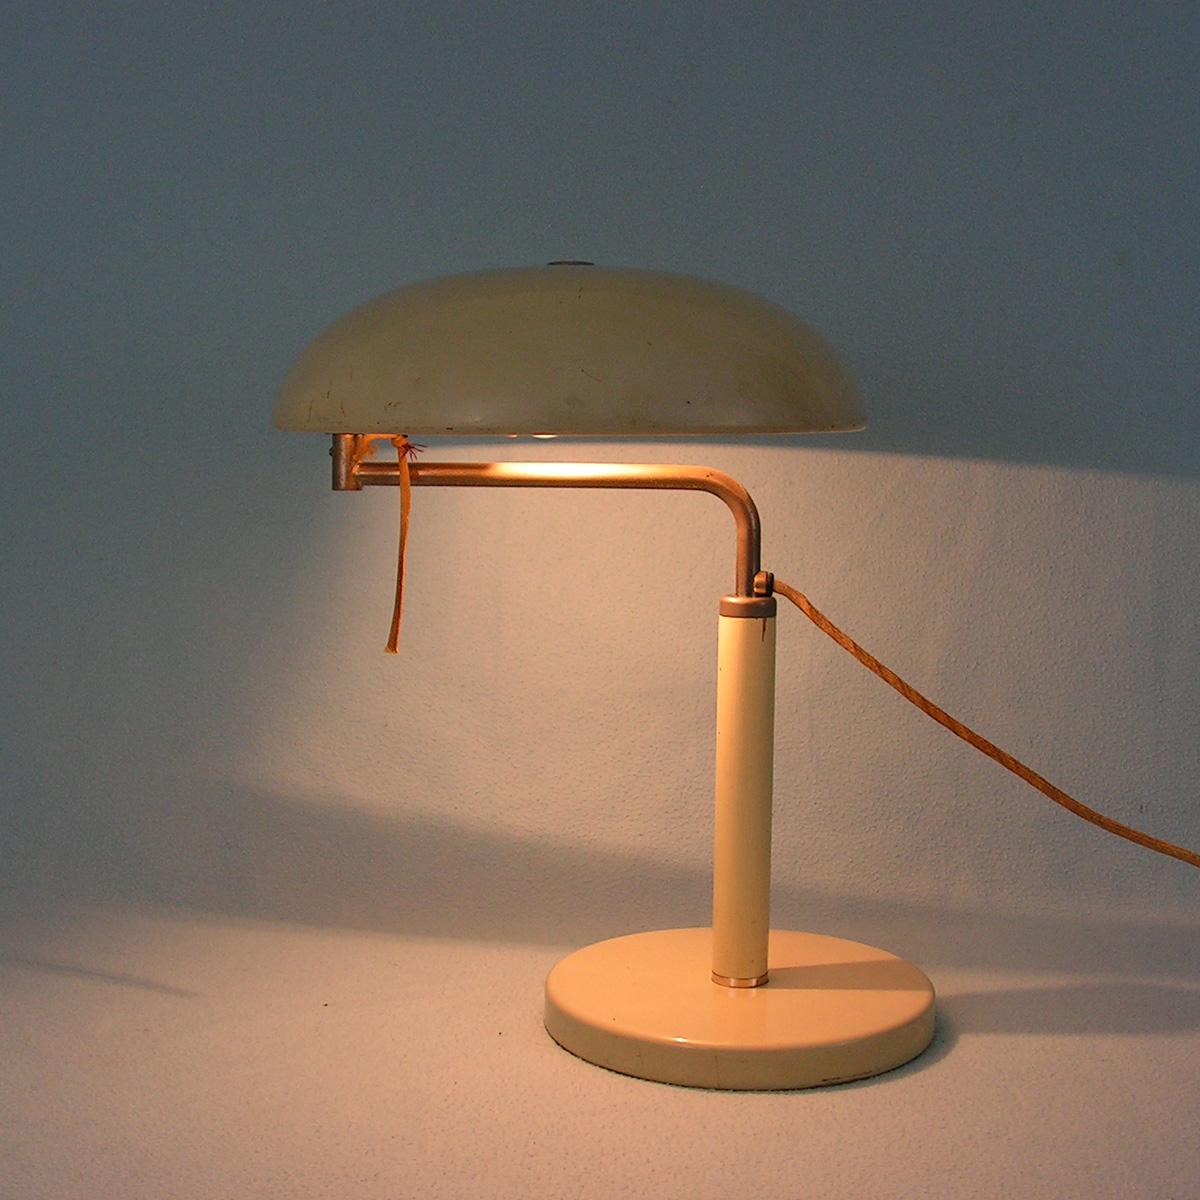 belmag-quick-1500-muller-desk-lamp-swiss-vintage